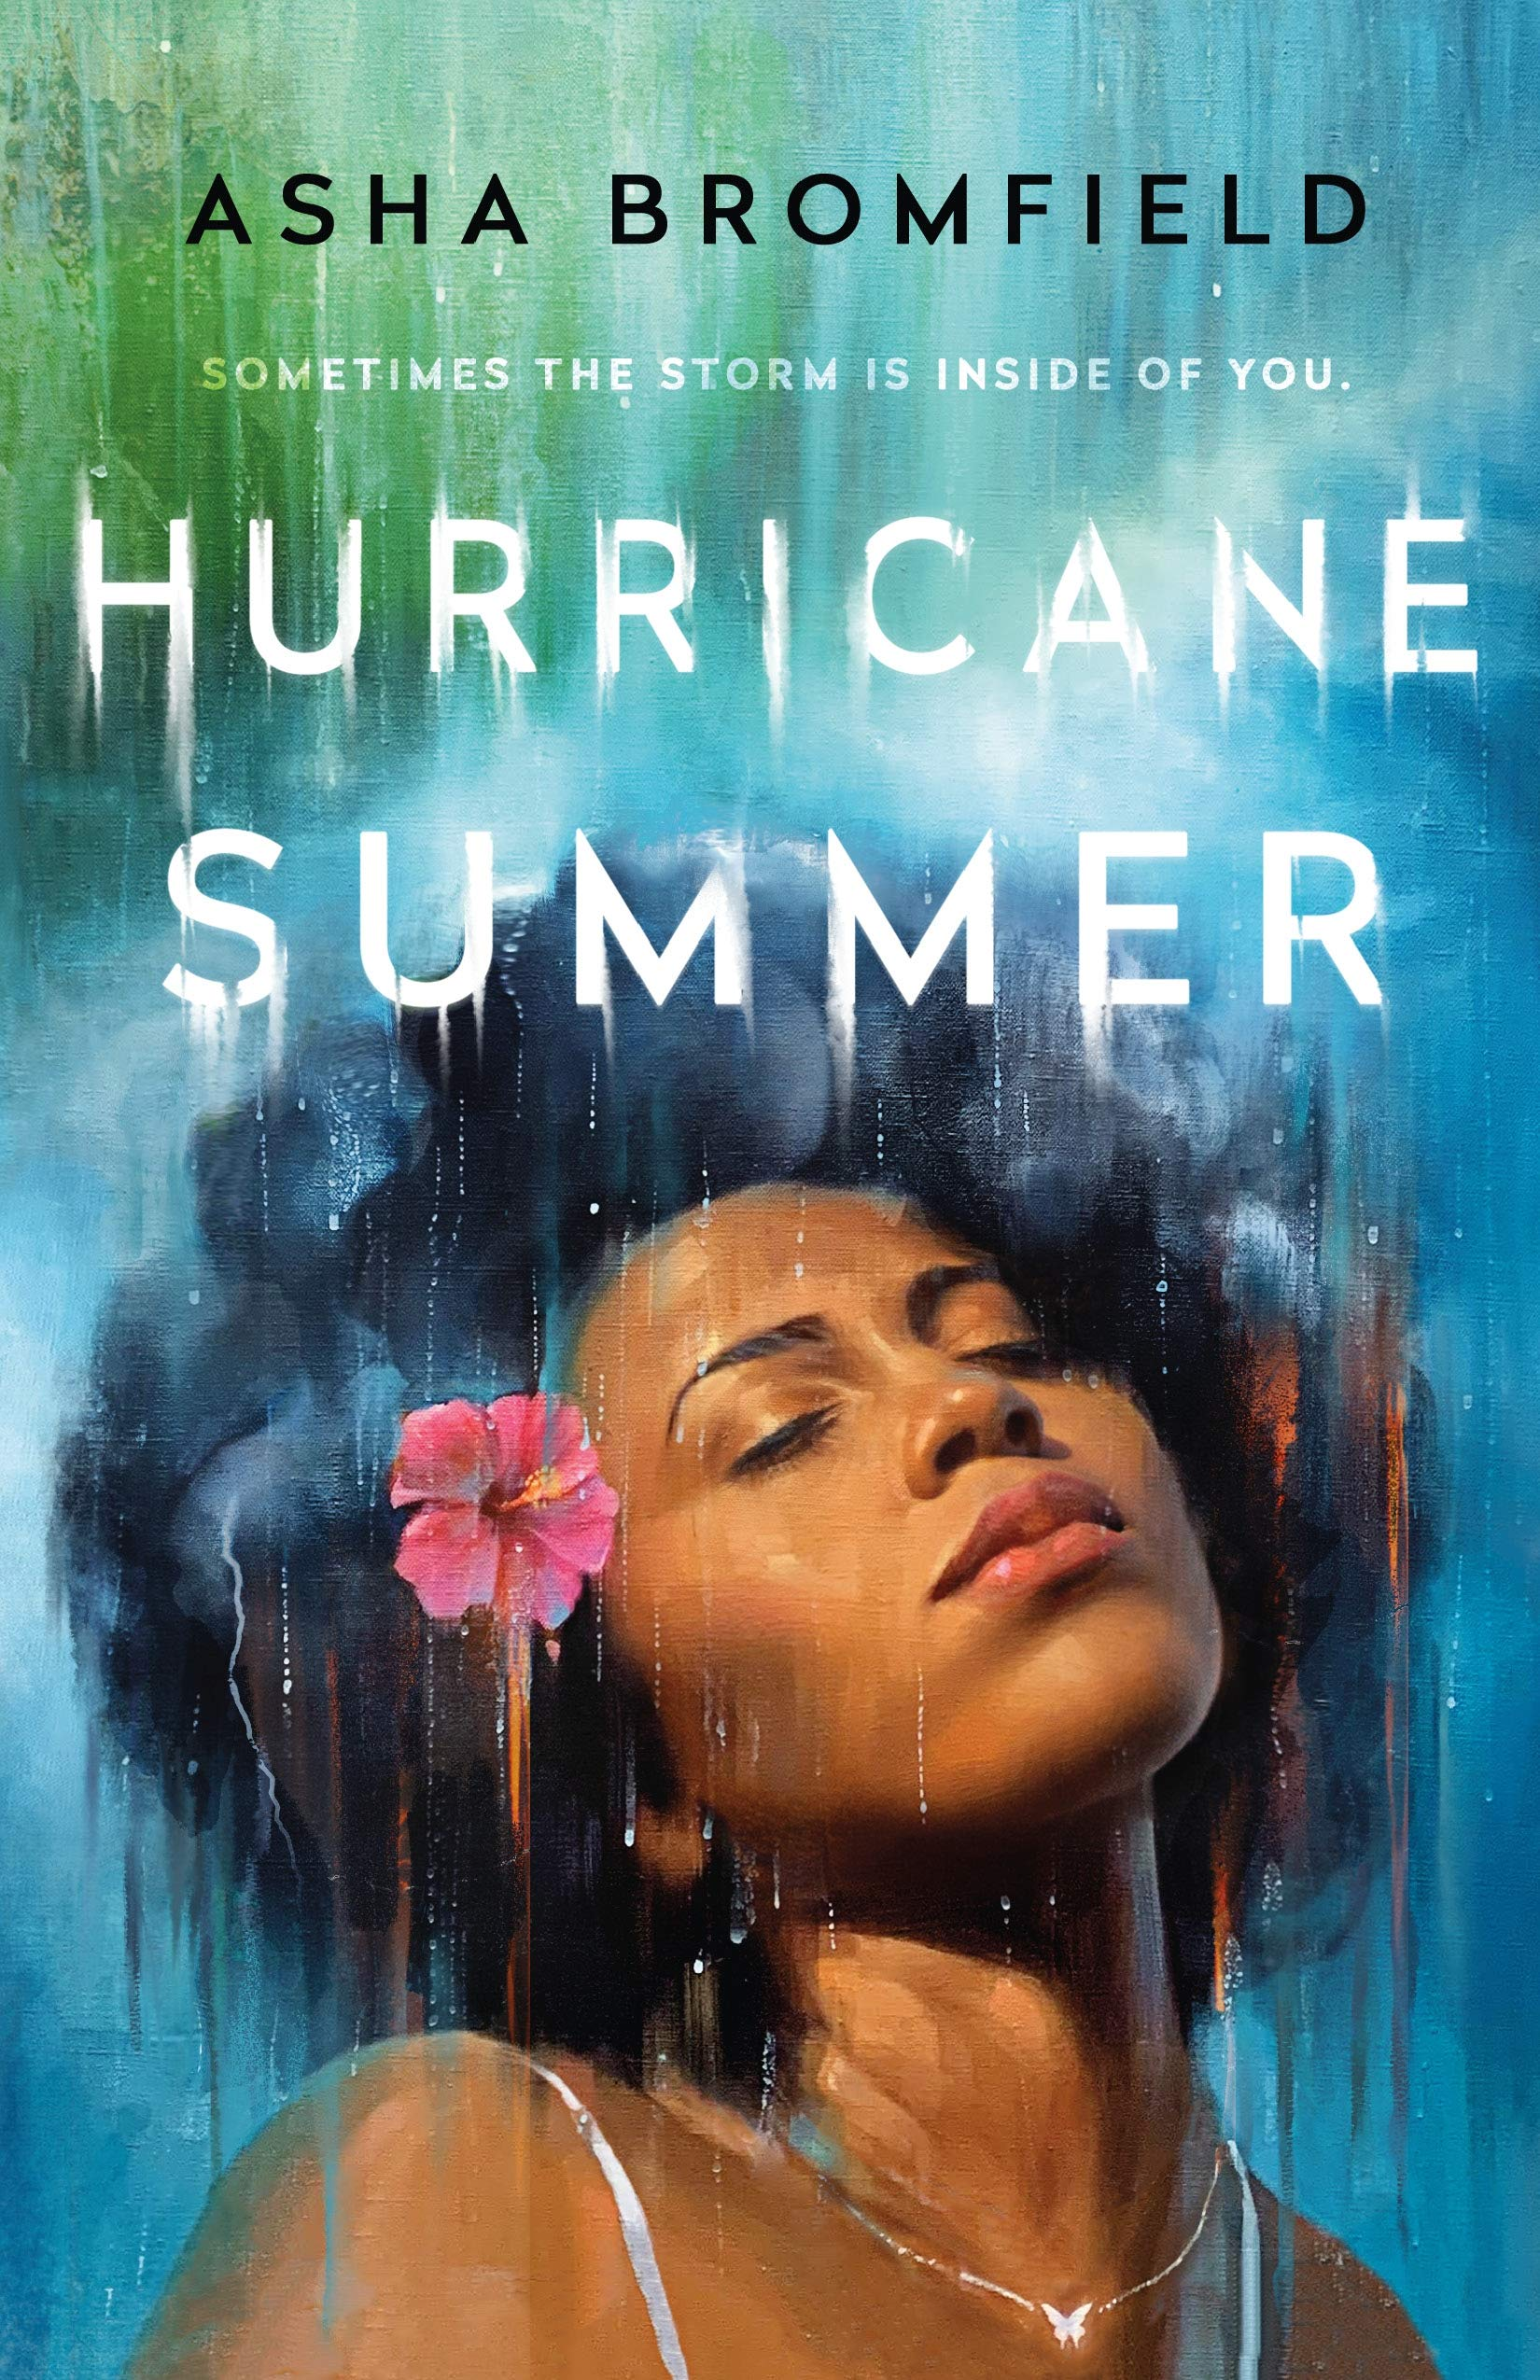 Amazon.com: Hurricane Summer: A Novel (9781250622235): Bromfield, Asha:  Books